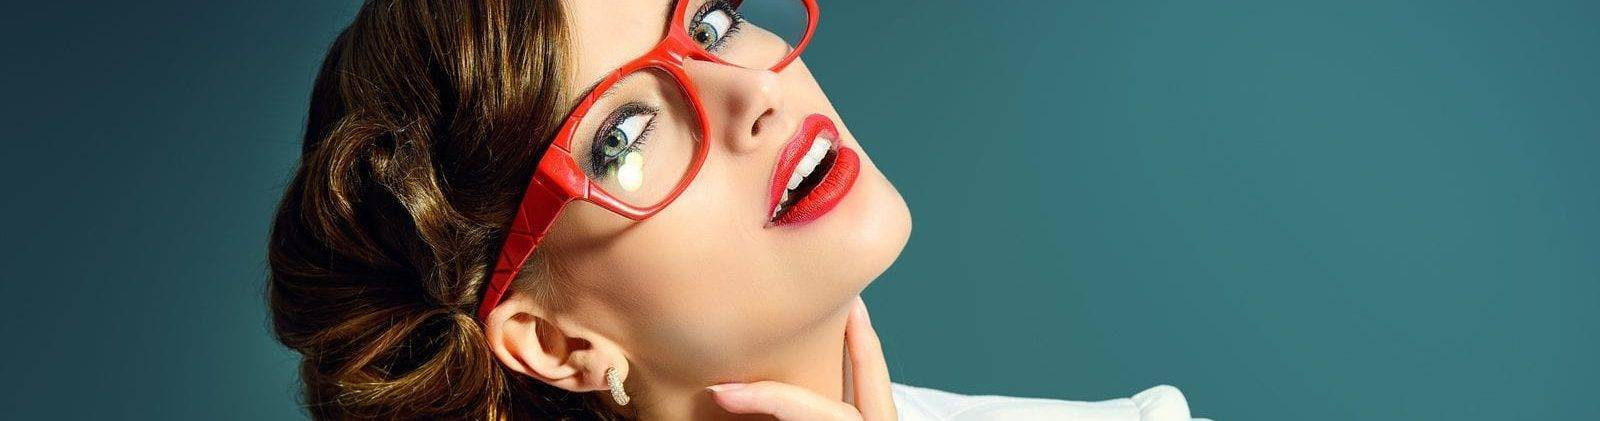 xhigh-definition-eyeglasses-1600x421.jpg.pagespeed.ic_.I3OowBQ8_j